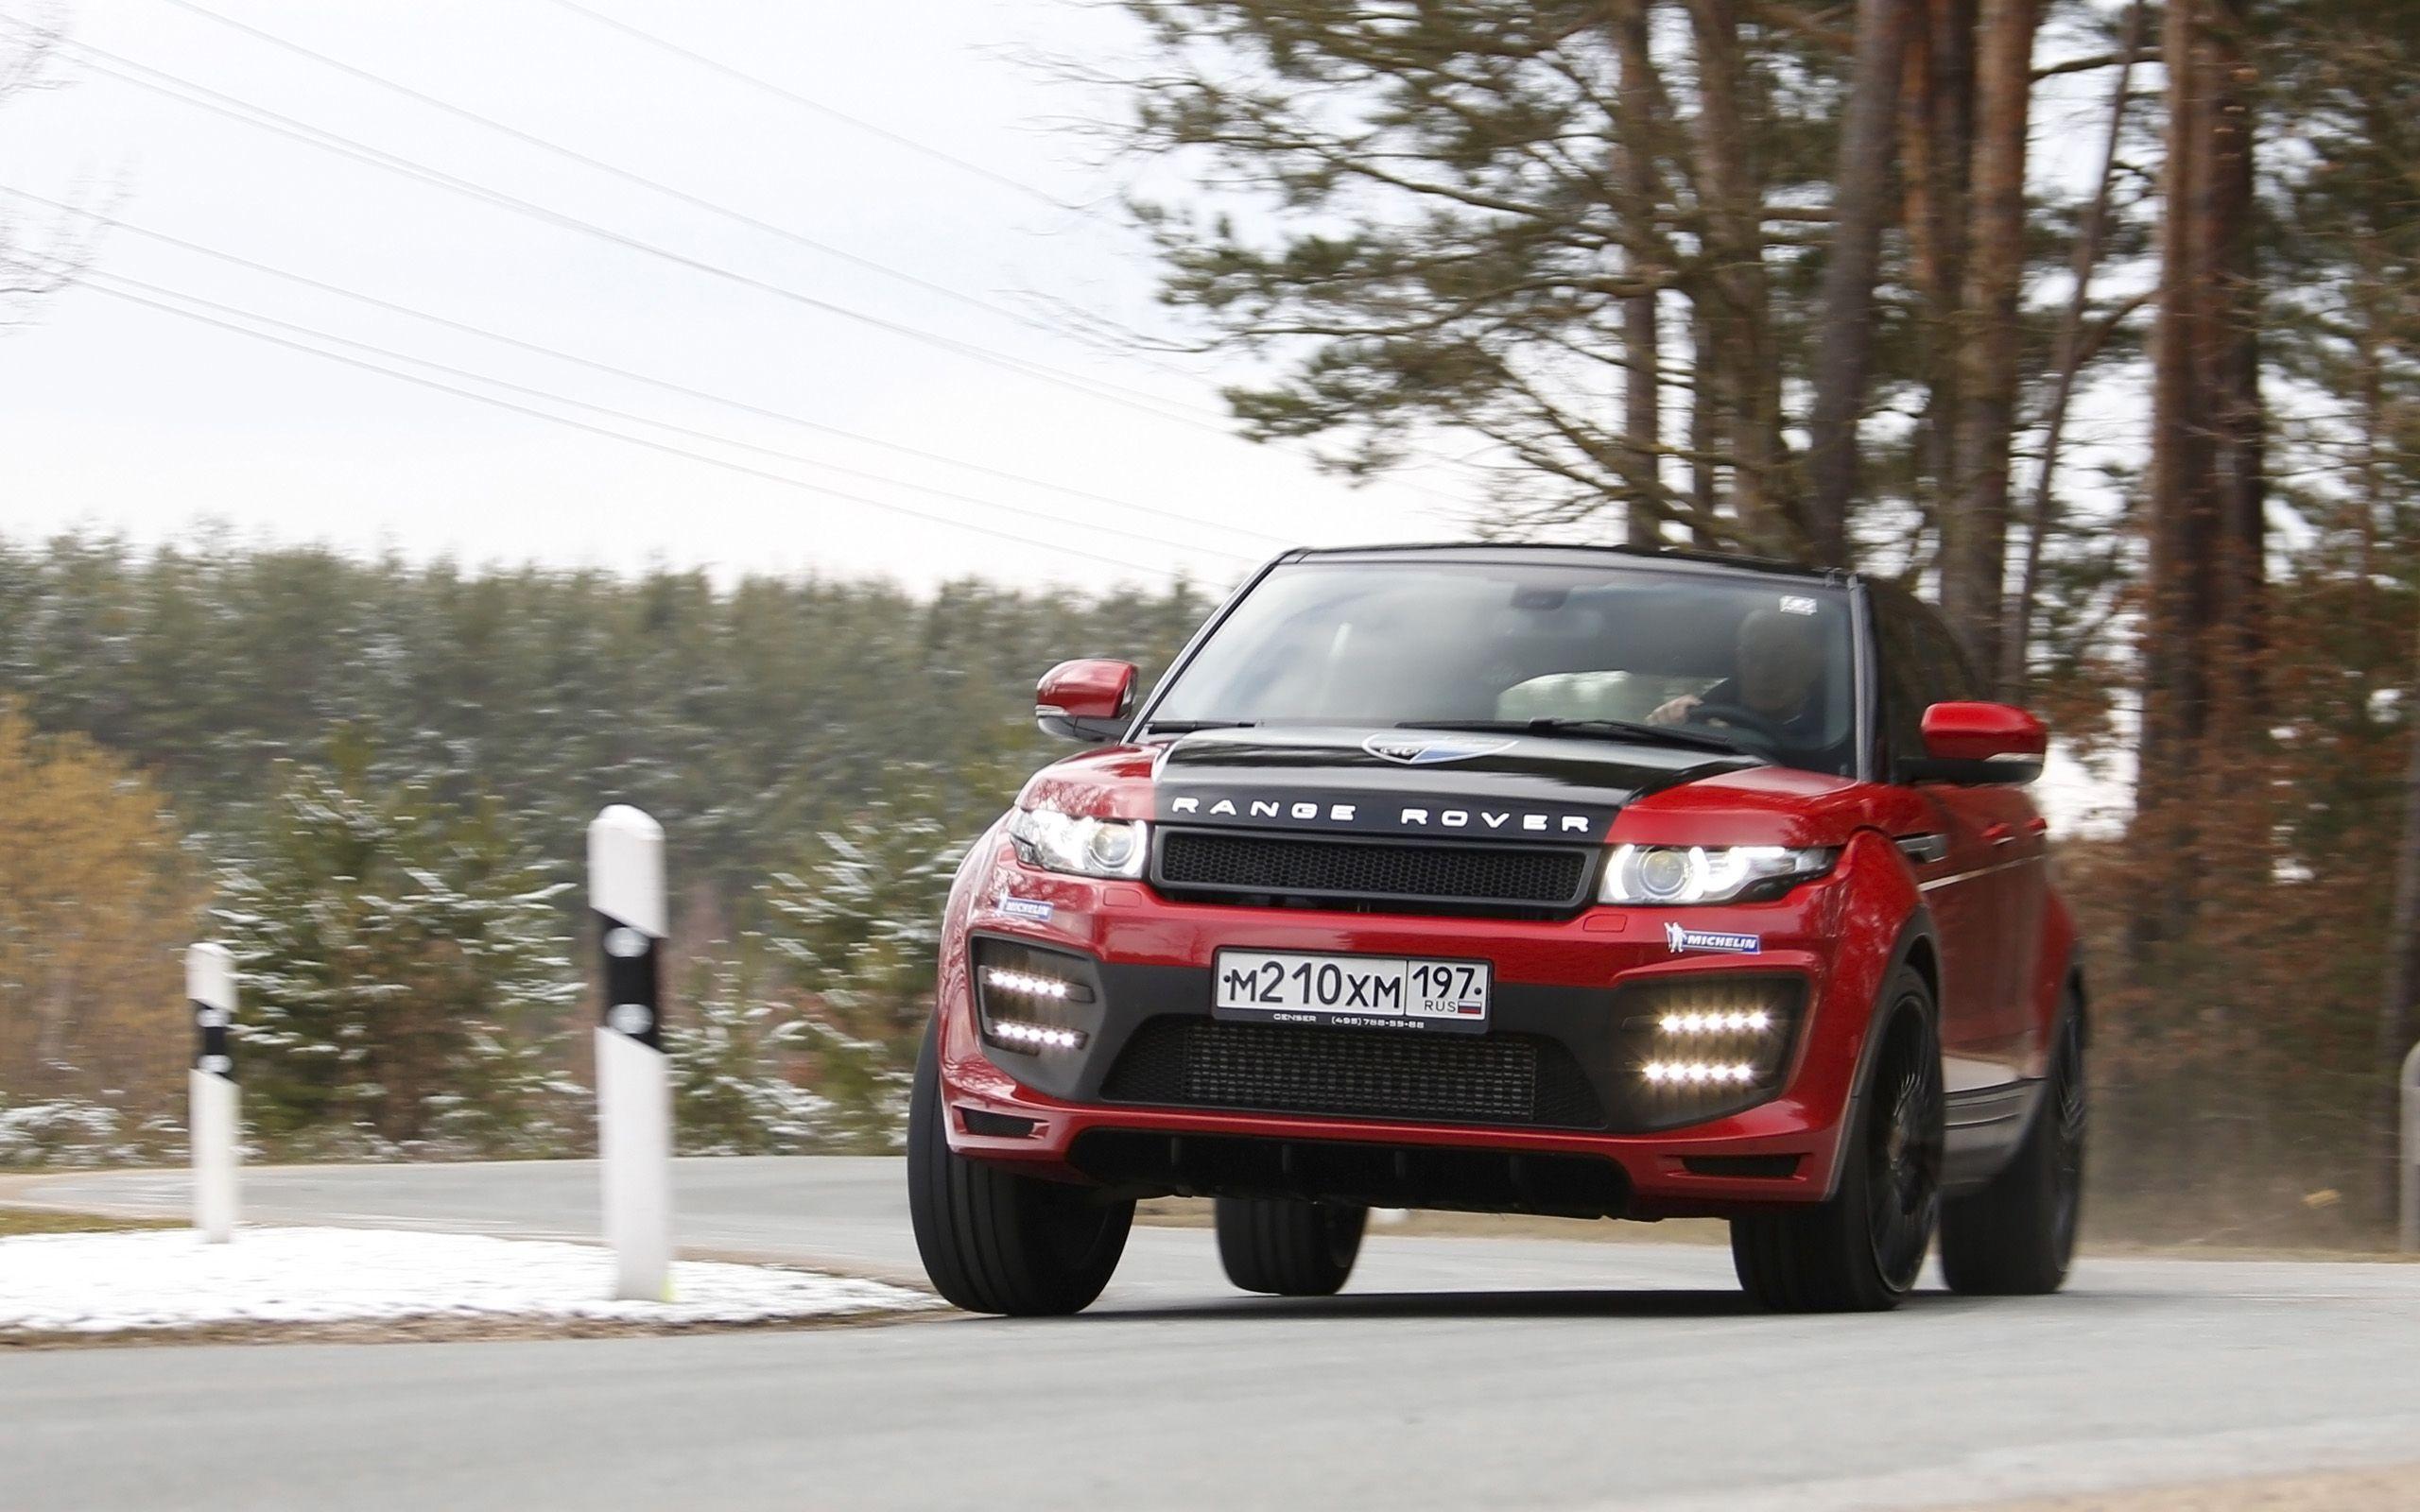 2014 Larte Design Range Rover Evoque Wallpapers 2014 Range Rover